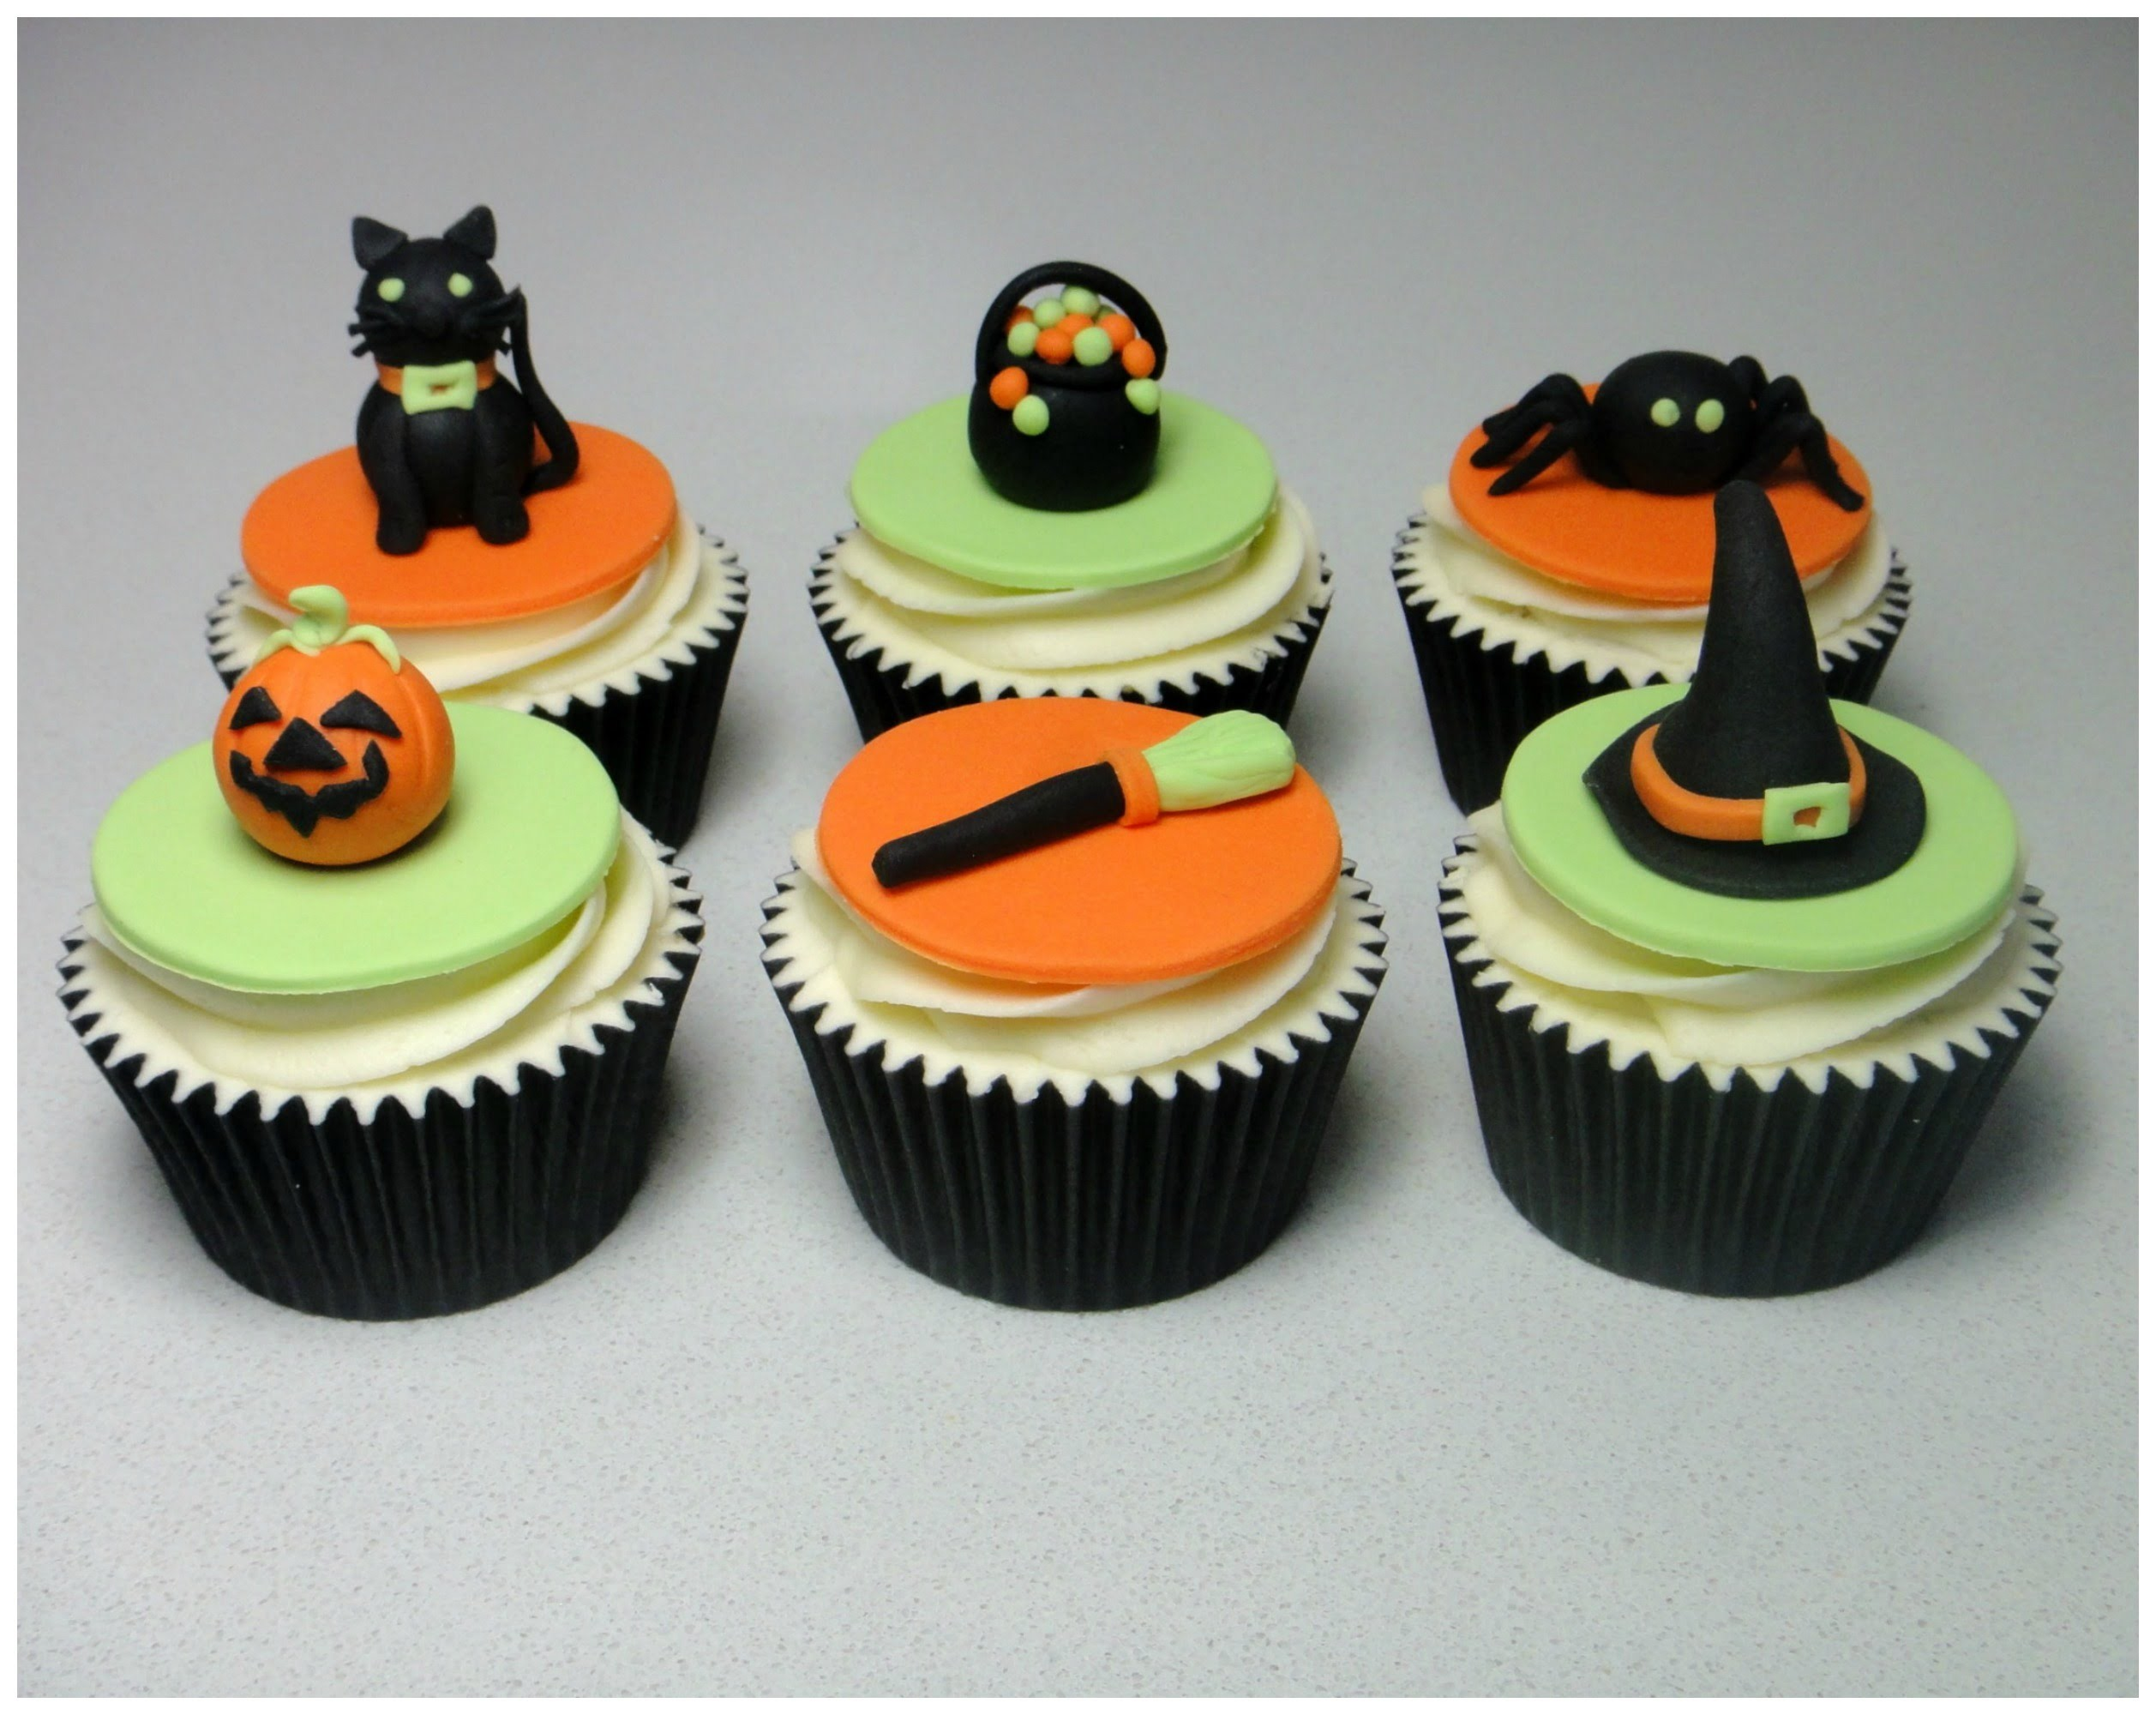 How to Make Halloween Sugarpaste. Fondant  Cupcake Topper Cake Decorating Tutorial